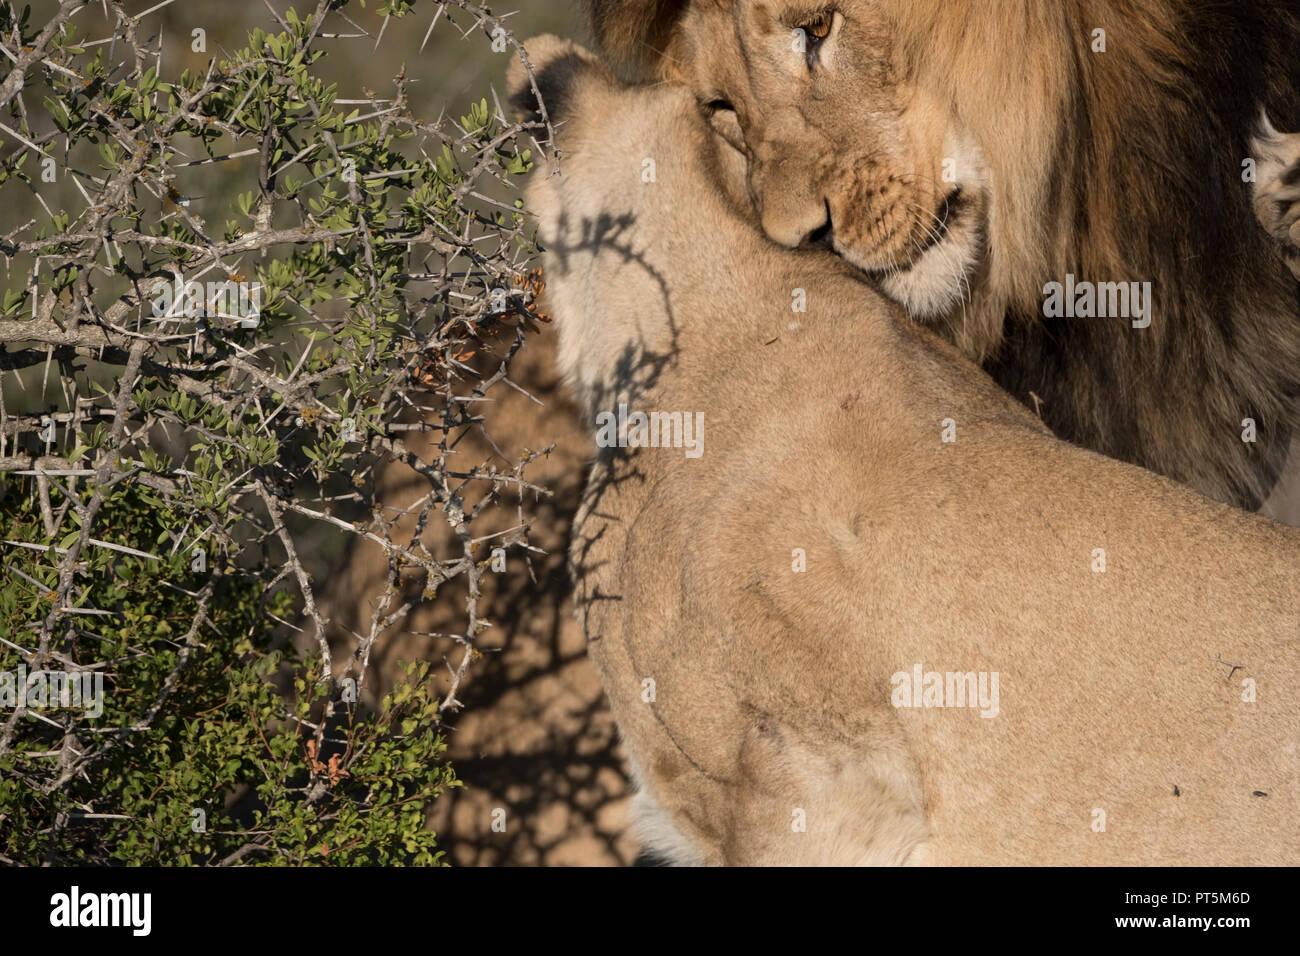 Lion intimacy - close up - Stock Image